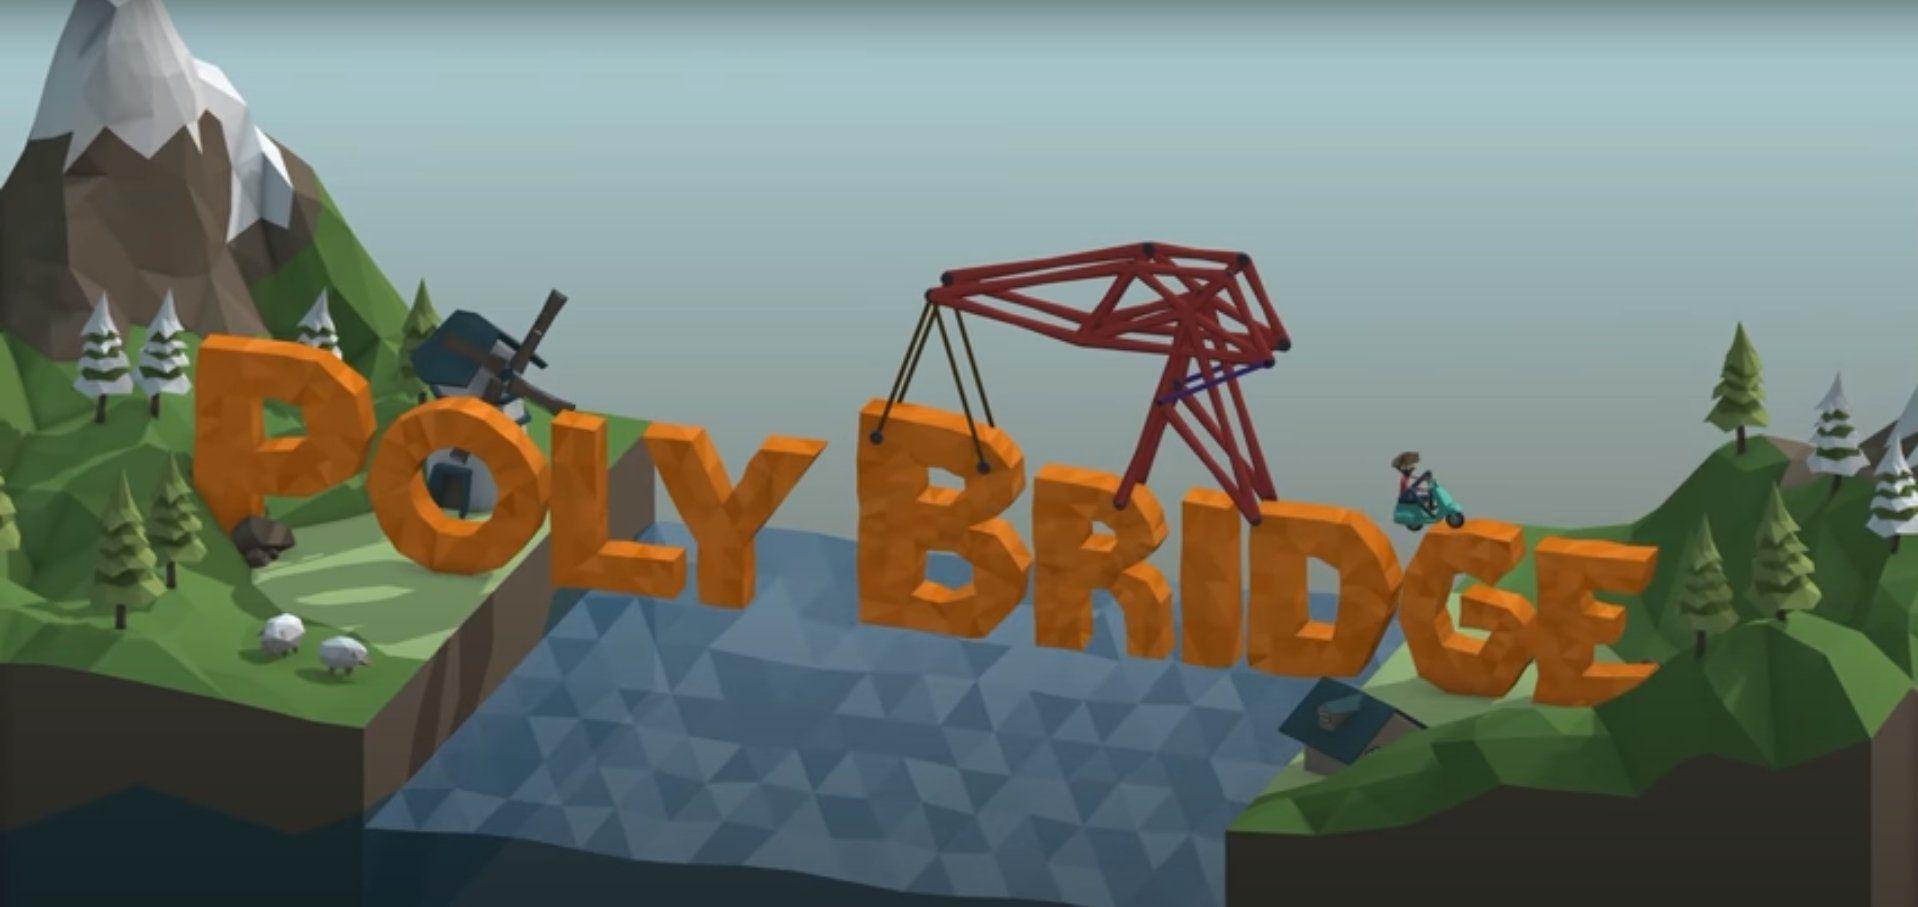 Poly Bridge Developers Reveal LongTerm Plans To Combat